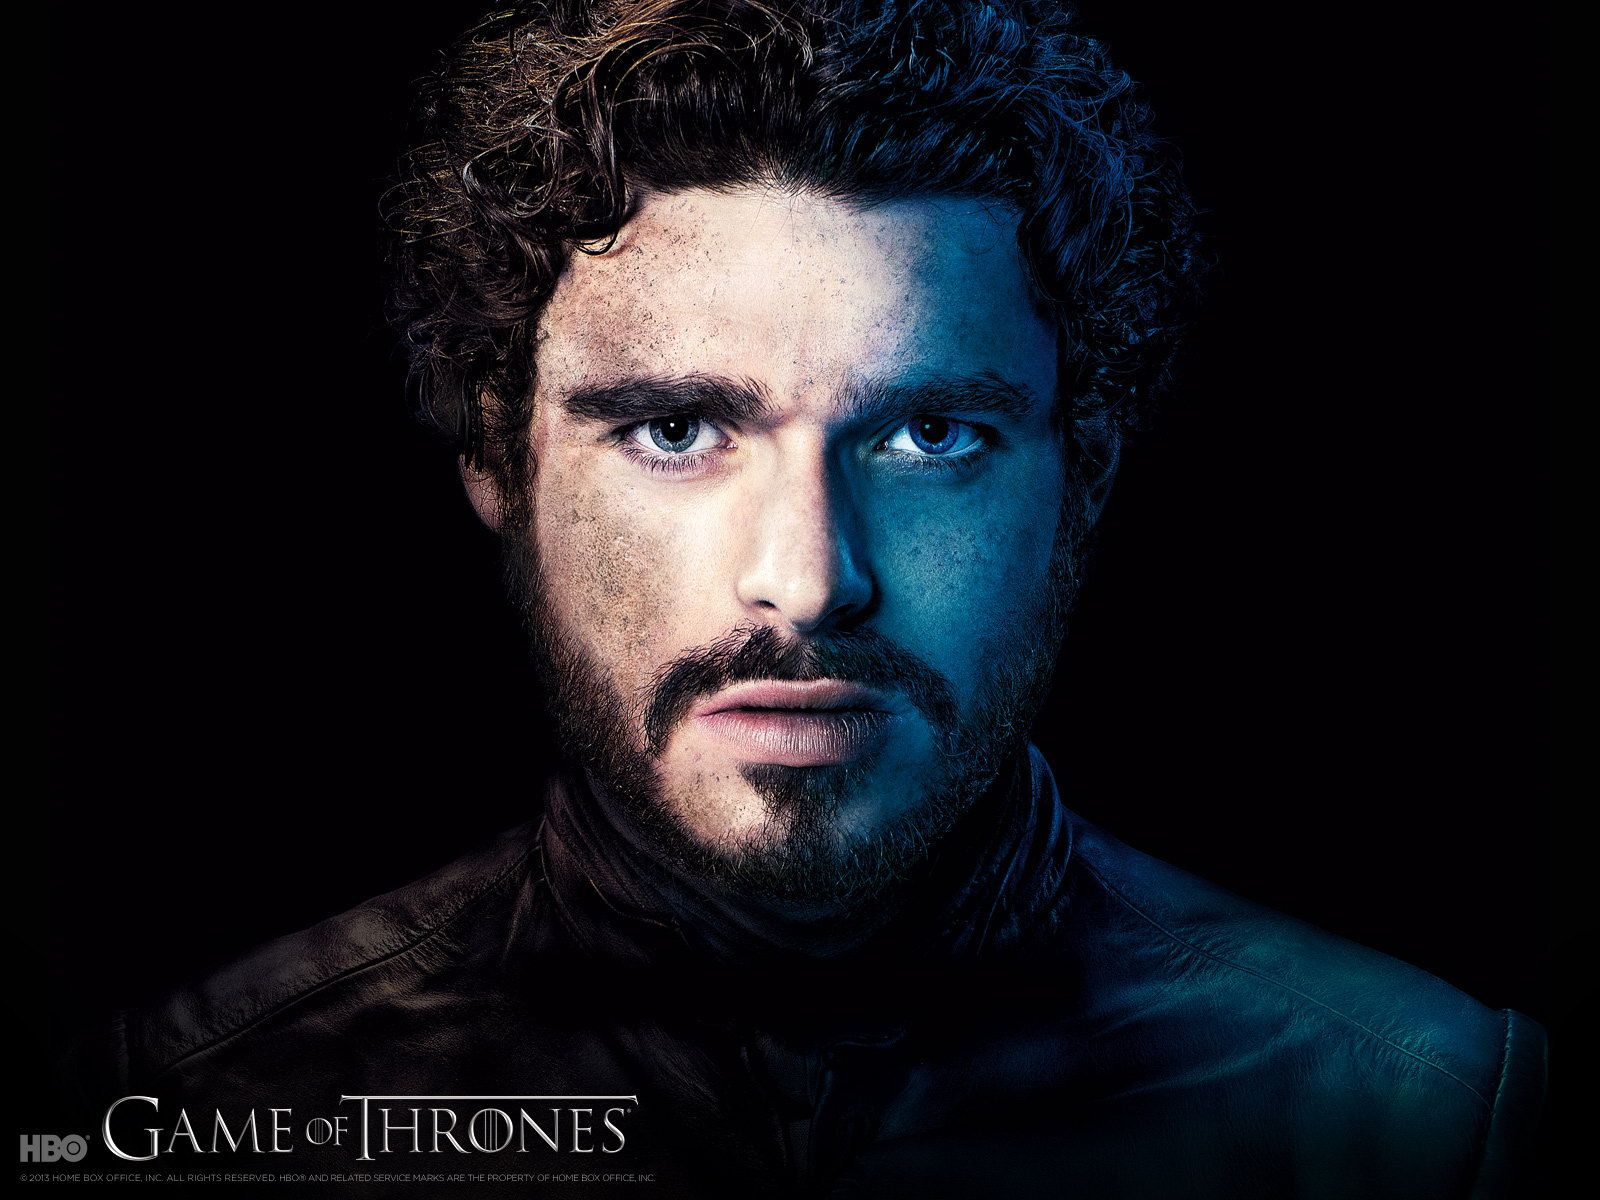 game of thrones season 4 | HBO-drama-Game-of-Thrones-Season-3-HD-characters-wallpaper-1600x1200 ...